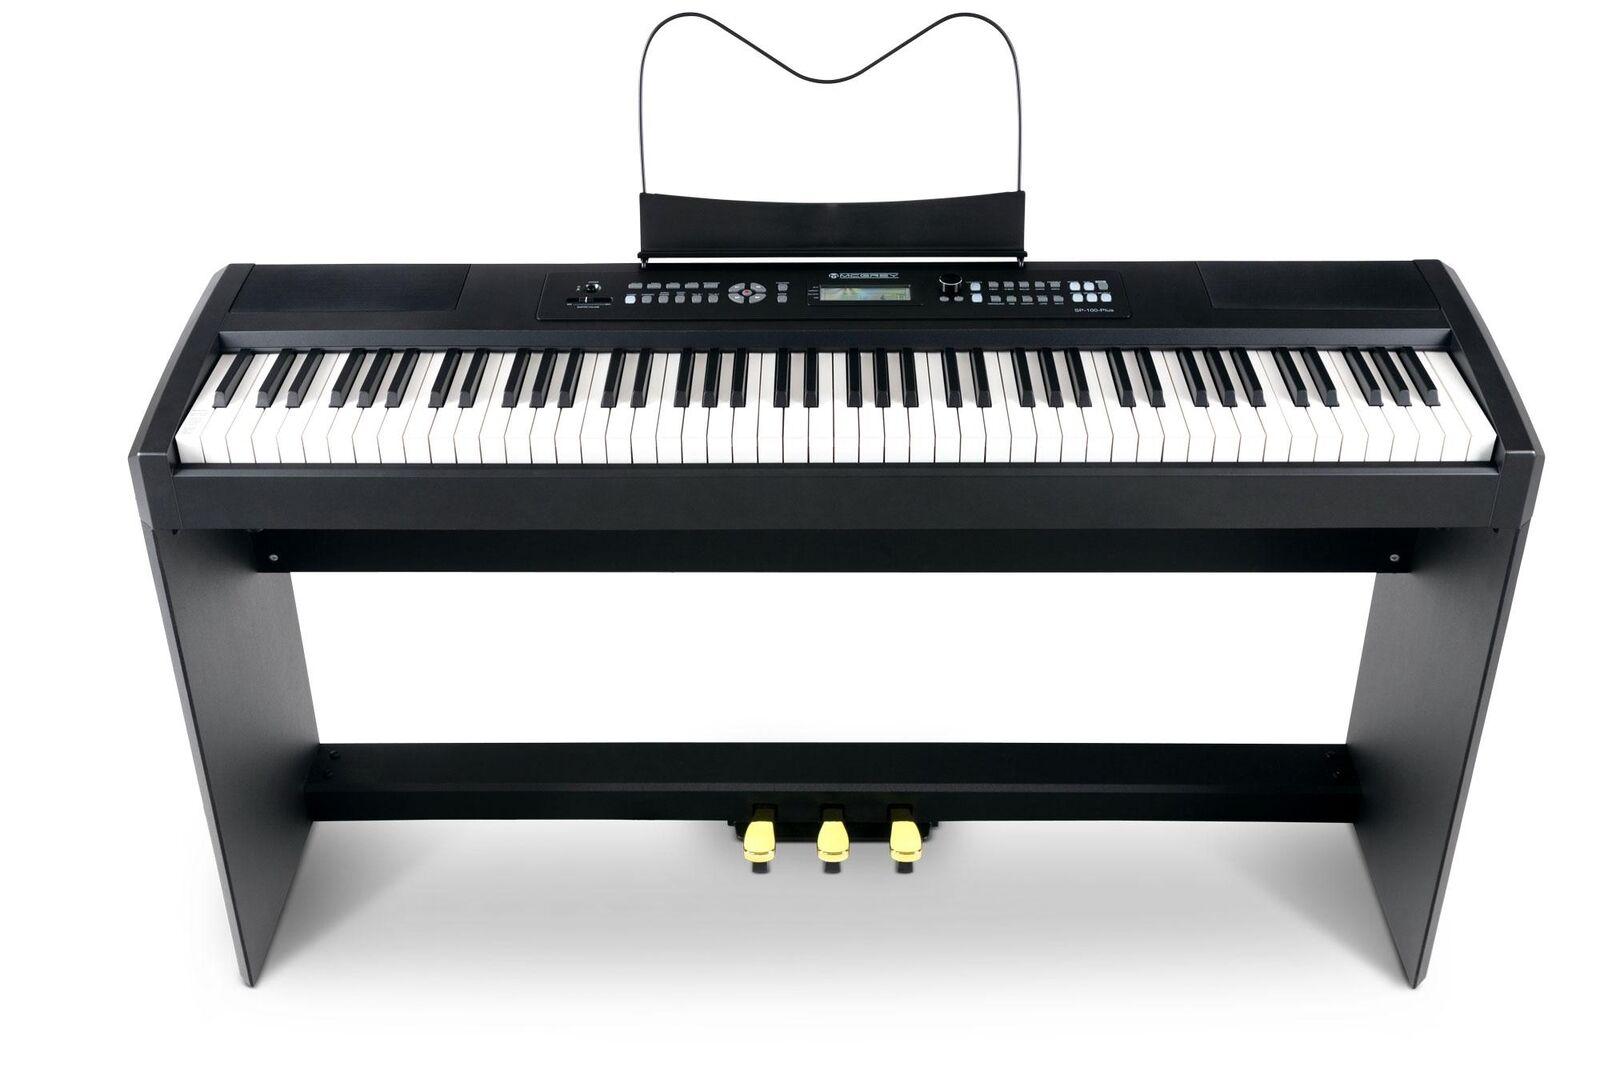 Starkes Compact Piano mit 88 Hammer-Tasten, Anschlagdynamik Anschlagdynamik Anschlagdynamik & passendem Unterbau cde91a